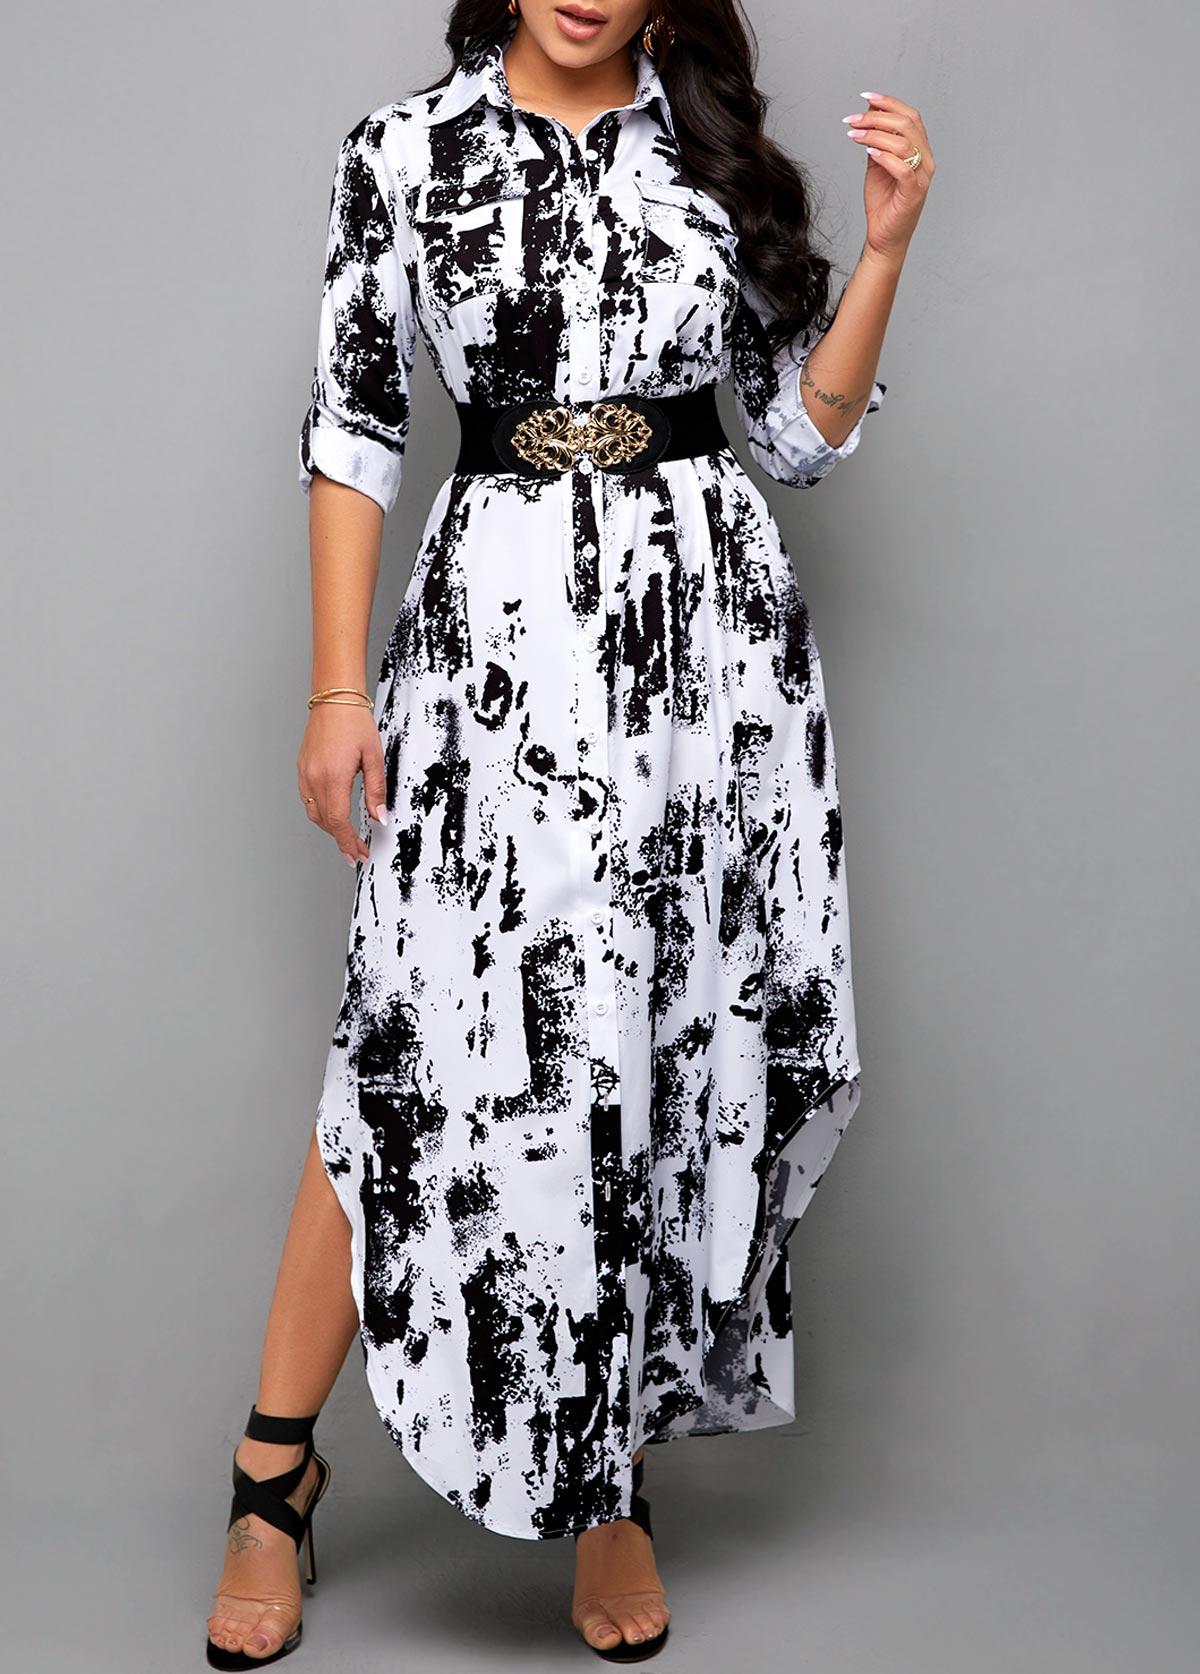 Asymmetric Hem Tie Dye Print Shirt Dress